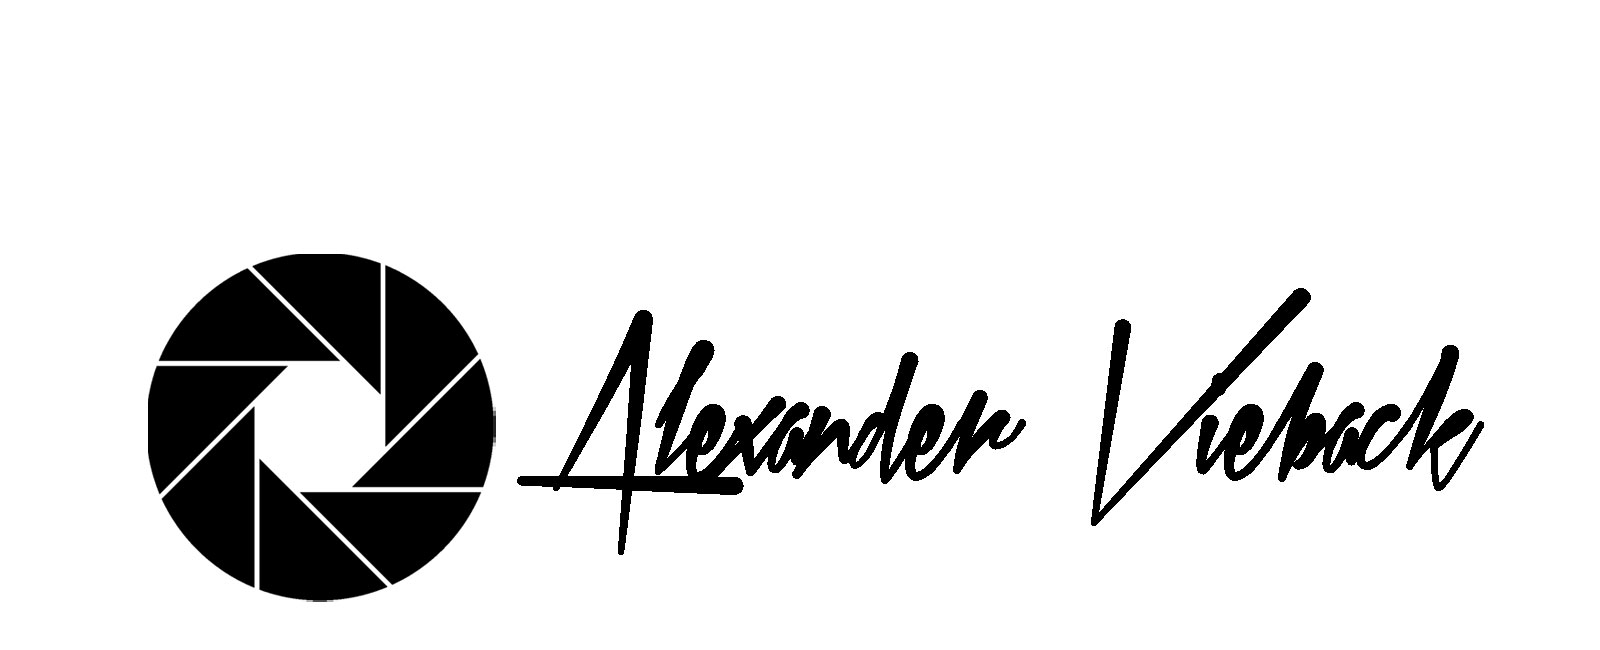 Alexander Vieback Fotografie